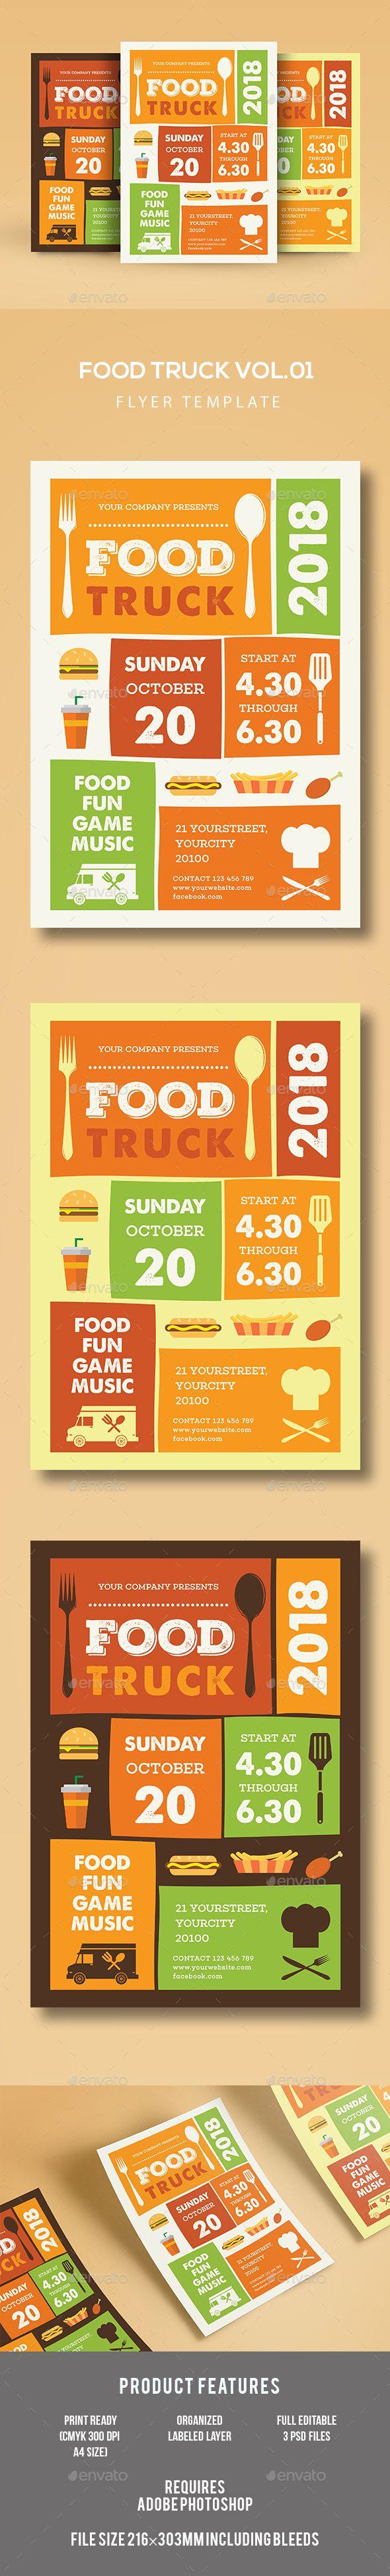 Food Truck Flyer Template PSD. Download here: http://graphicriver.net/item/food-truck-flyer/16891928?ref=ksioks